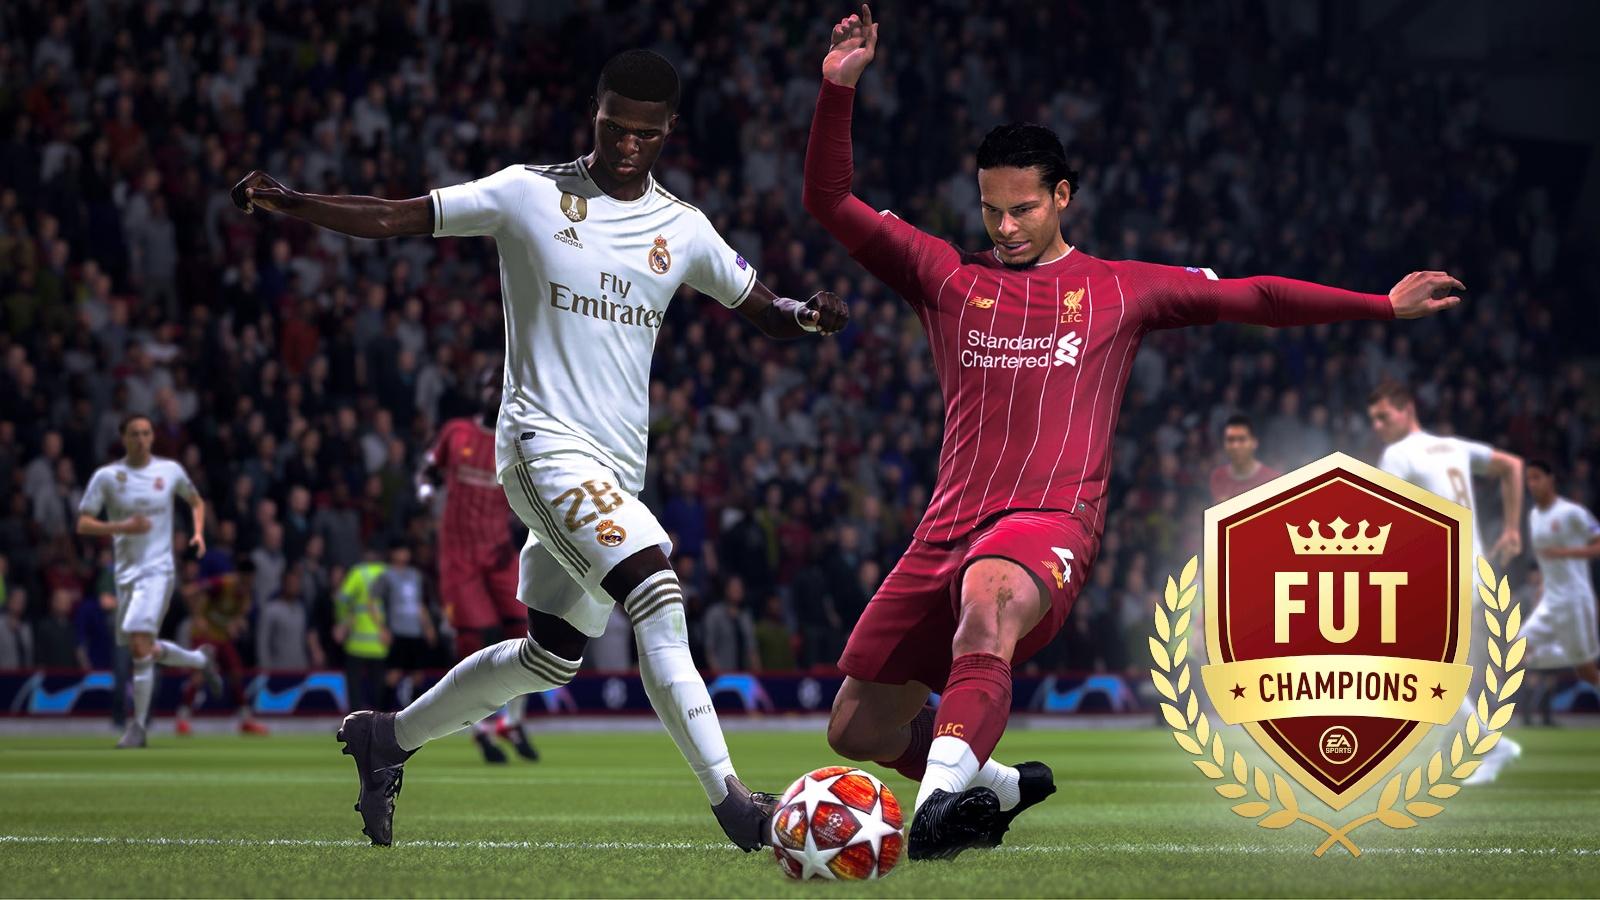 FIFA 21 FUT Champs logo